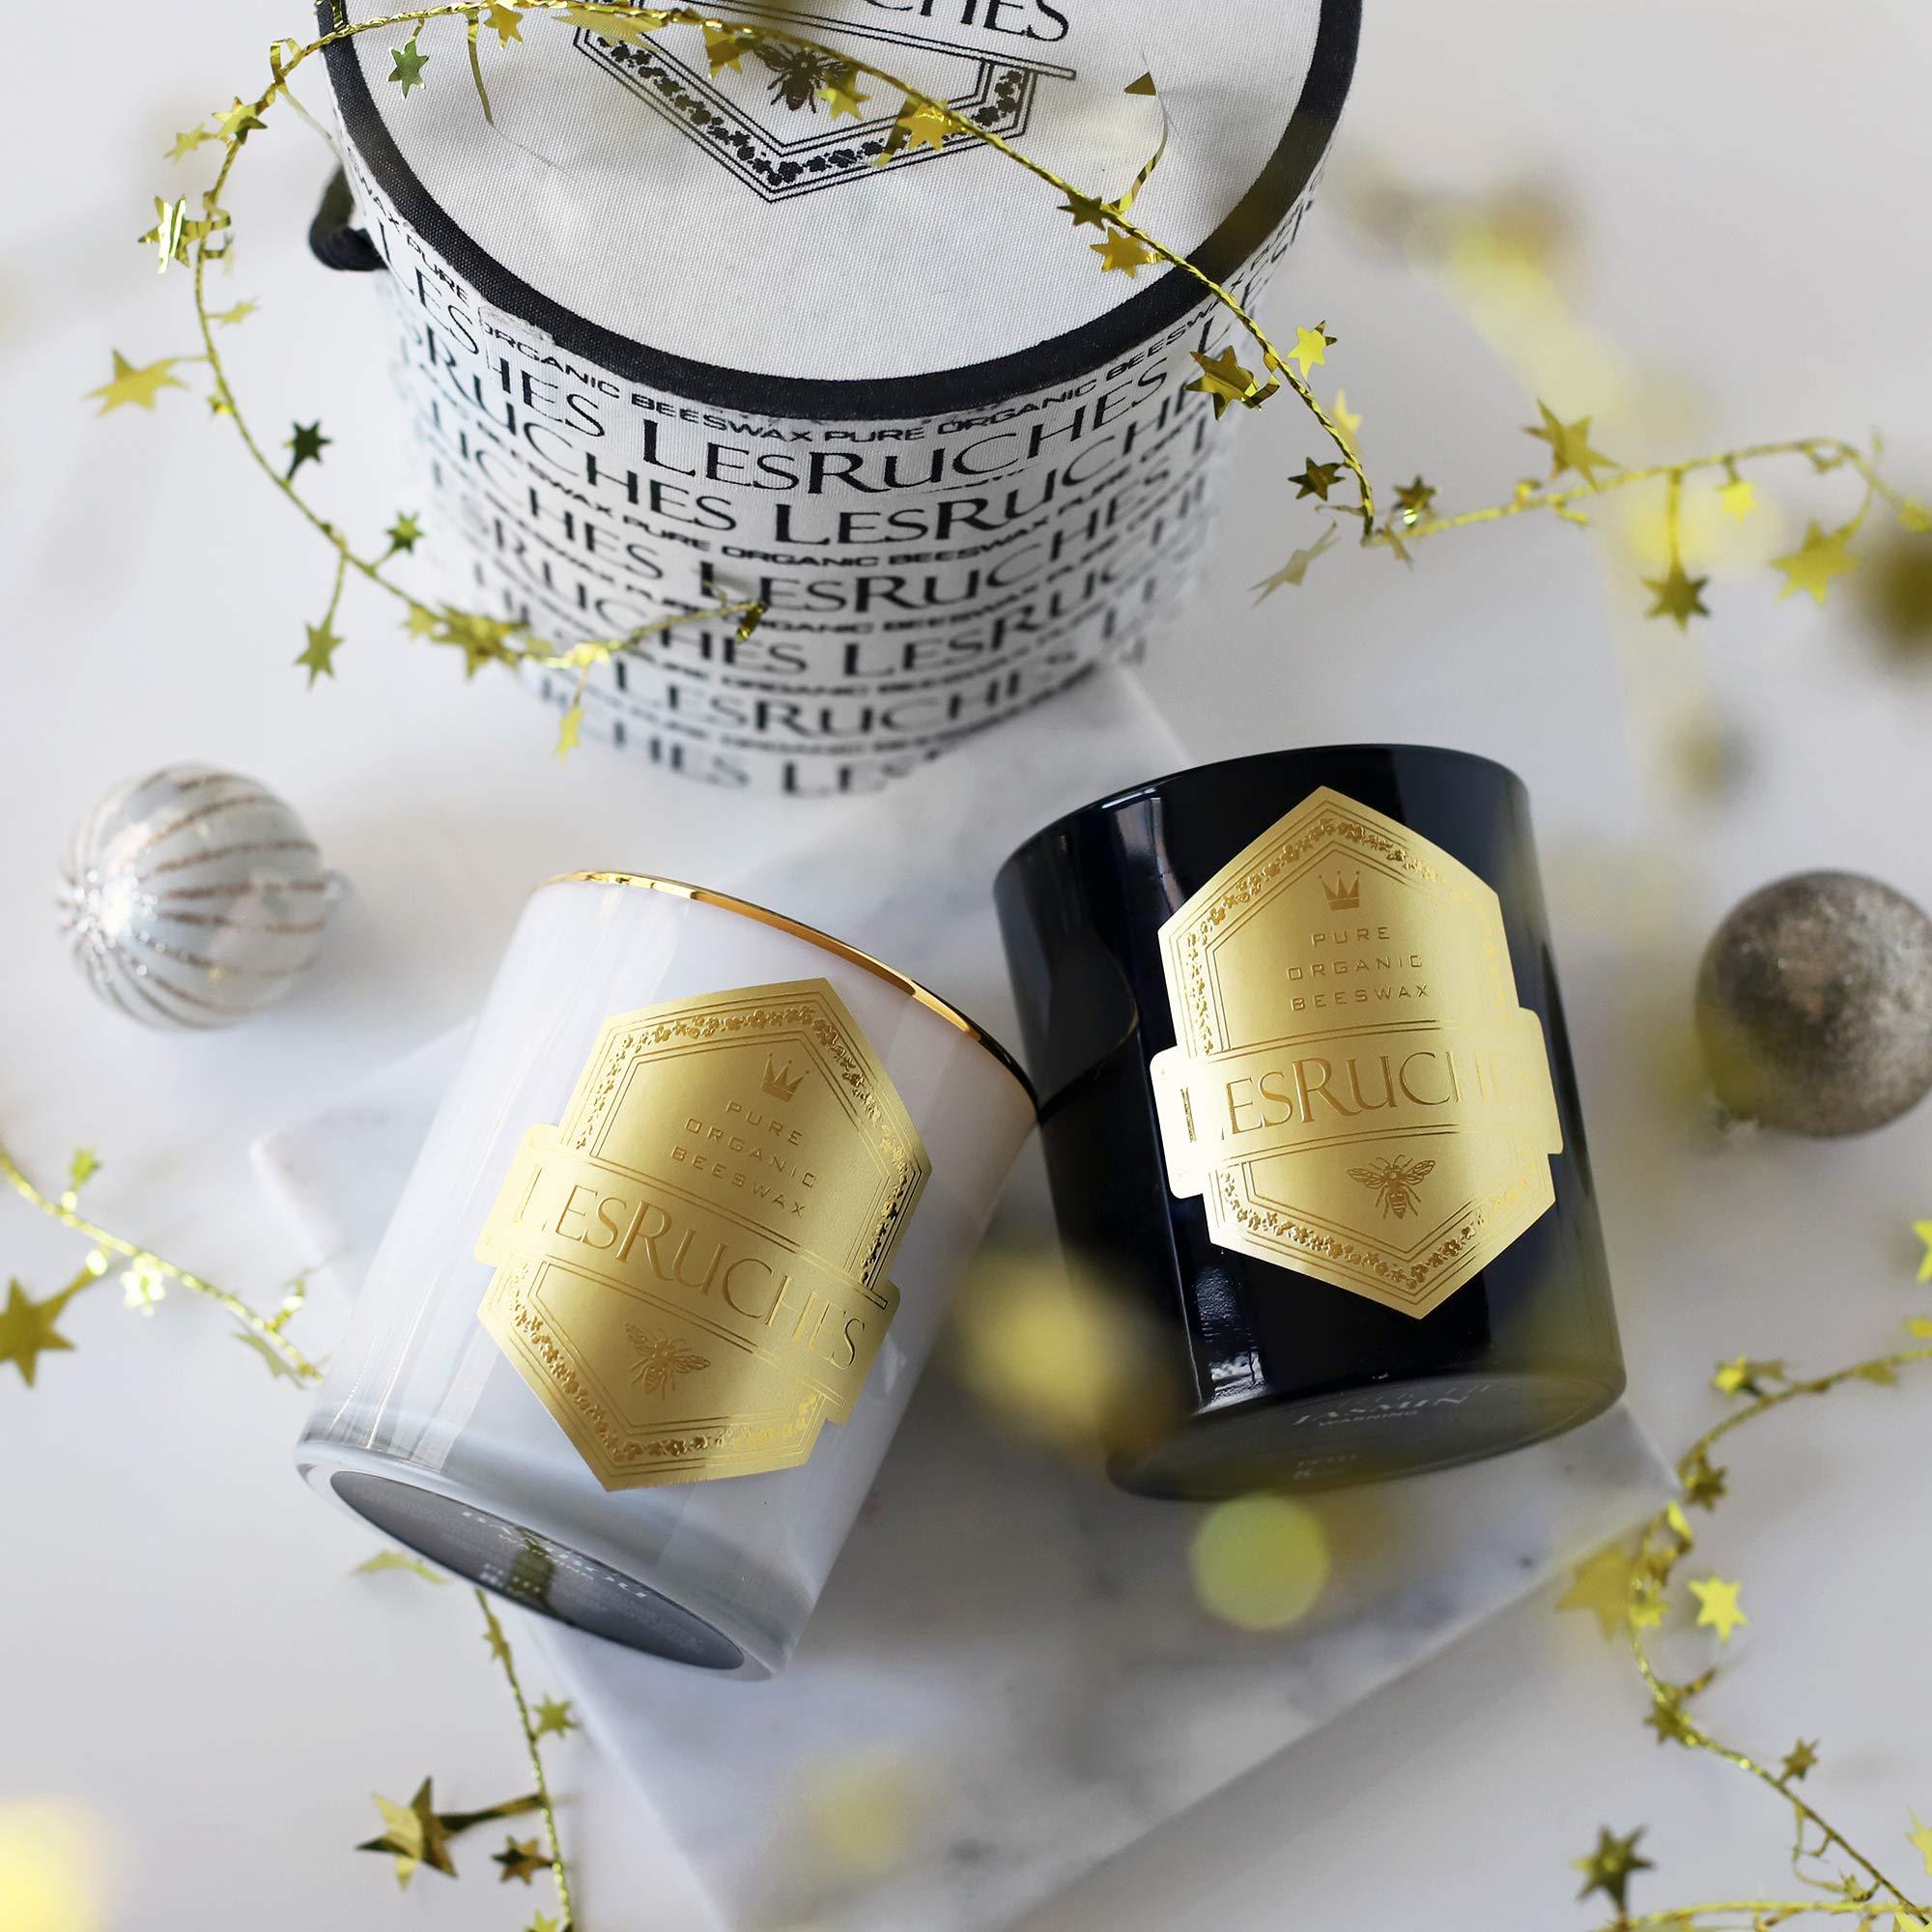 LesRuches Gardenia Organic Beeswax Luxury Candle 9.5 oz.